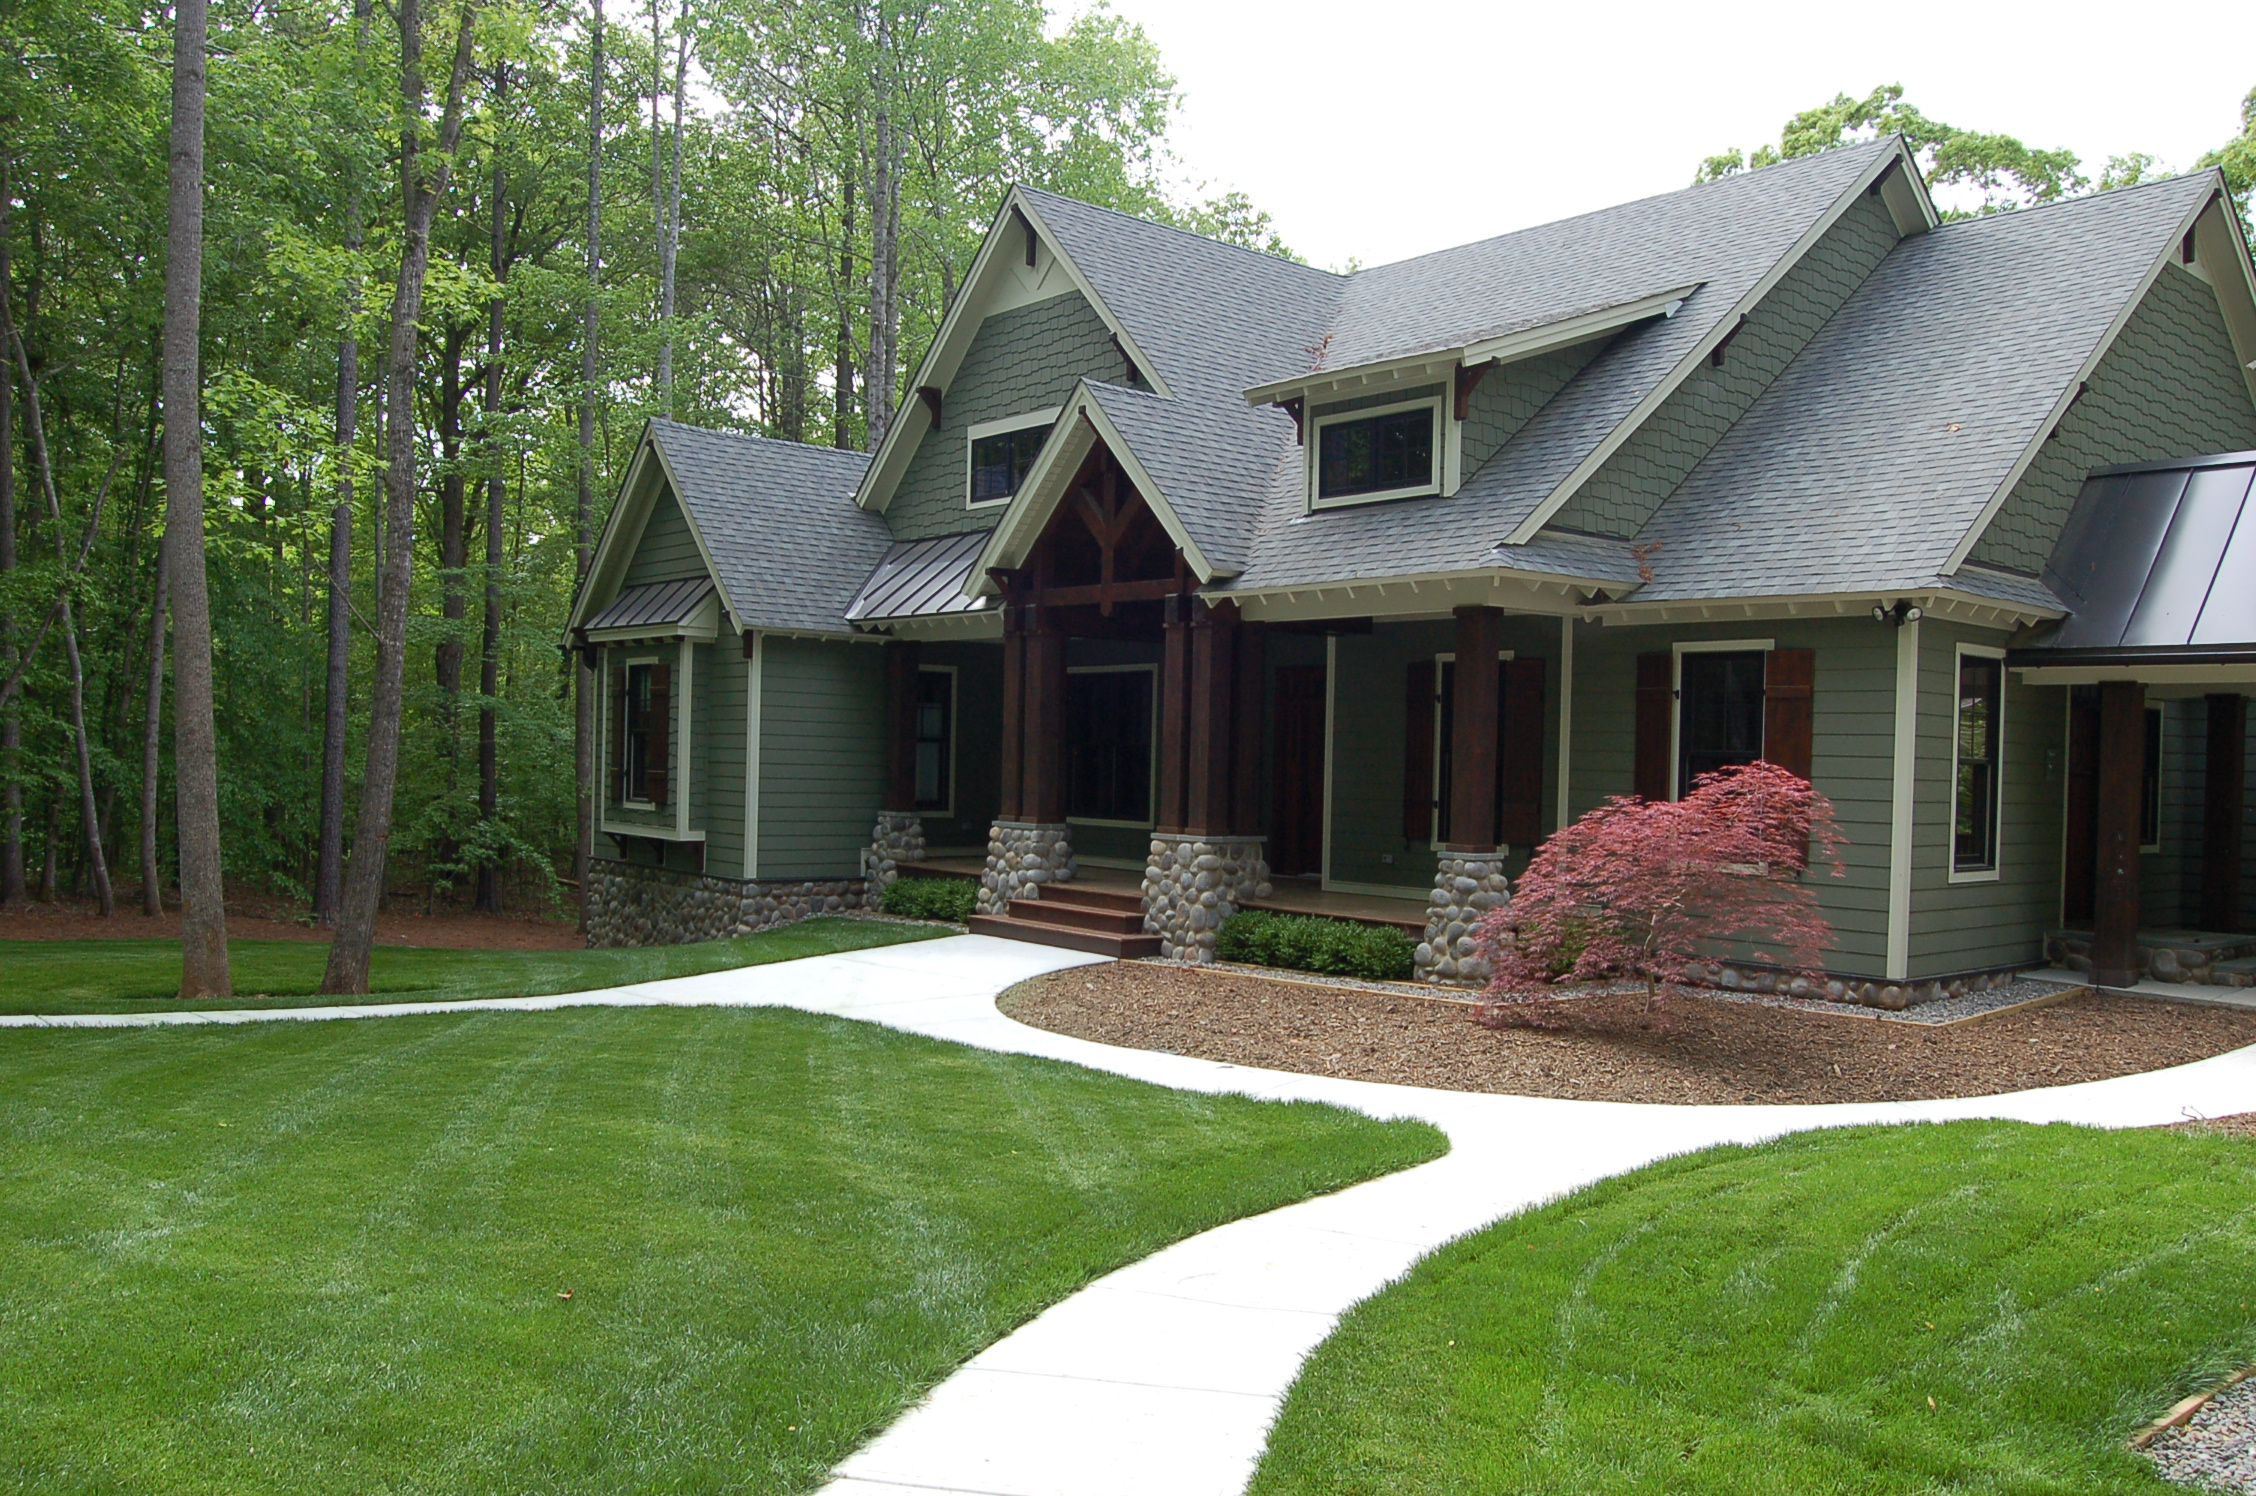 Papis lawn Services - Landscape - Landscaping - Yulee FL - Fernandina FL - Jacksonville FL (2).jpg